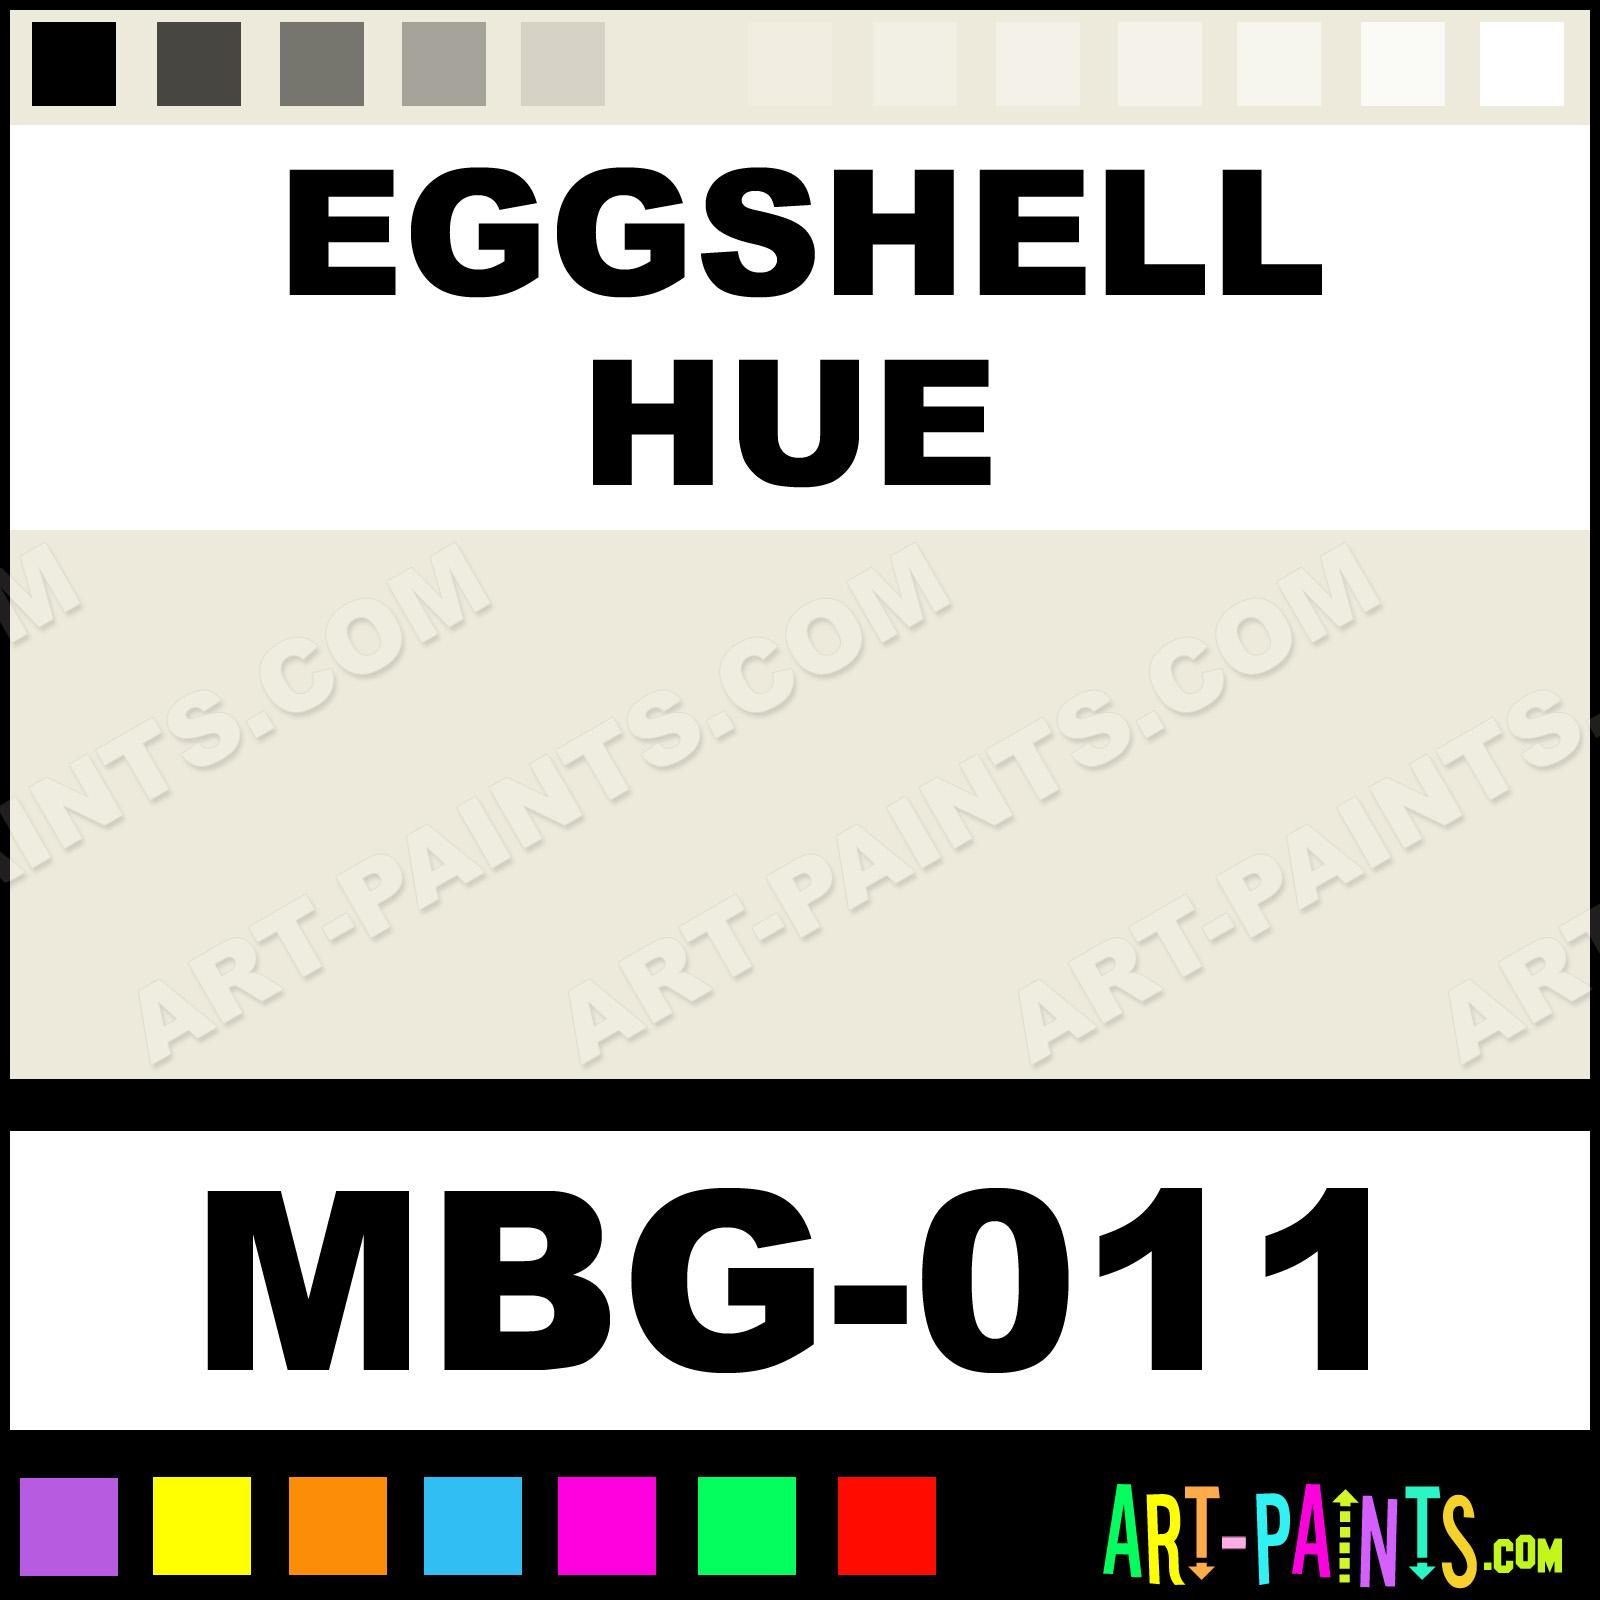 Eggshell Cone 6 Ceramic Paints MBG011 Eggshell Paint